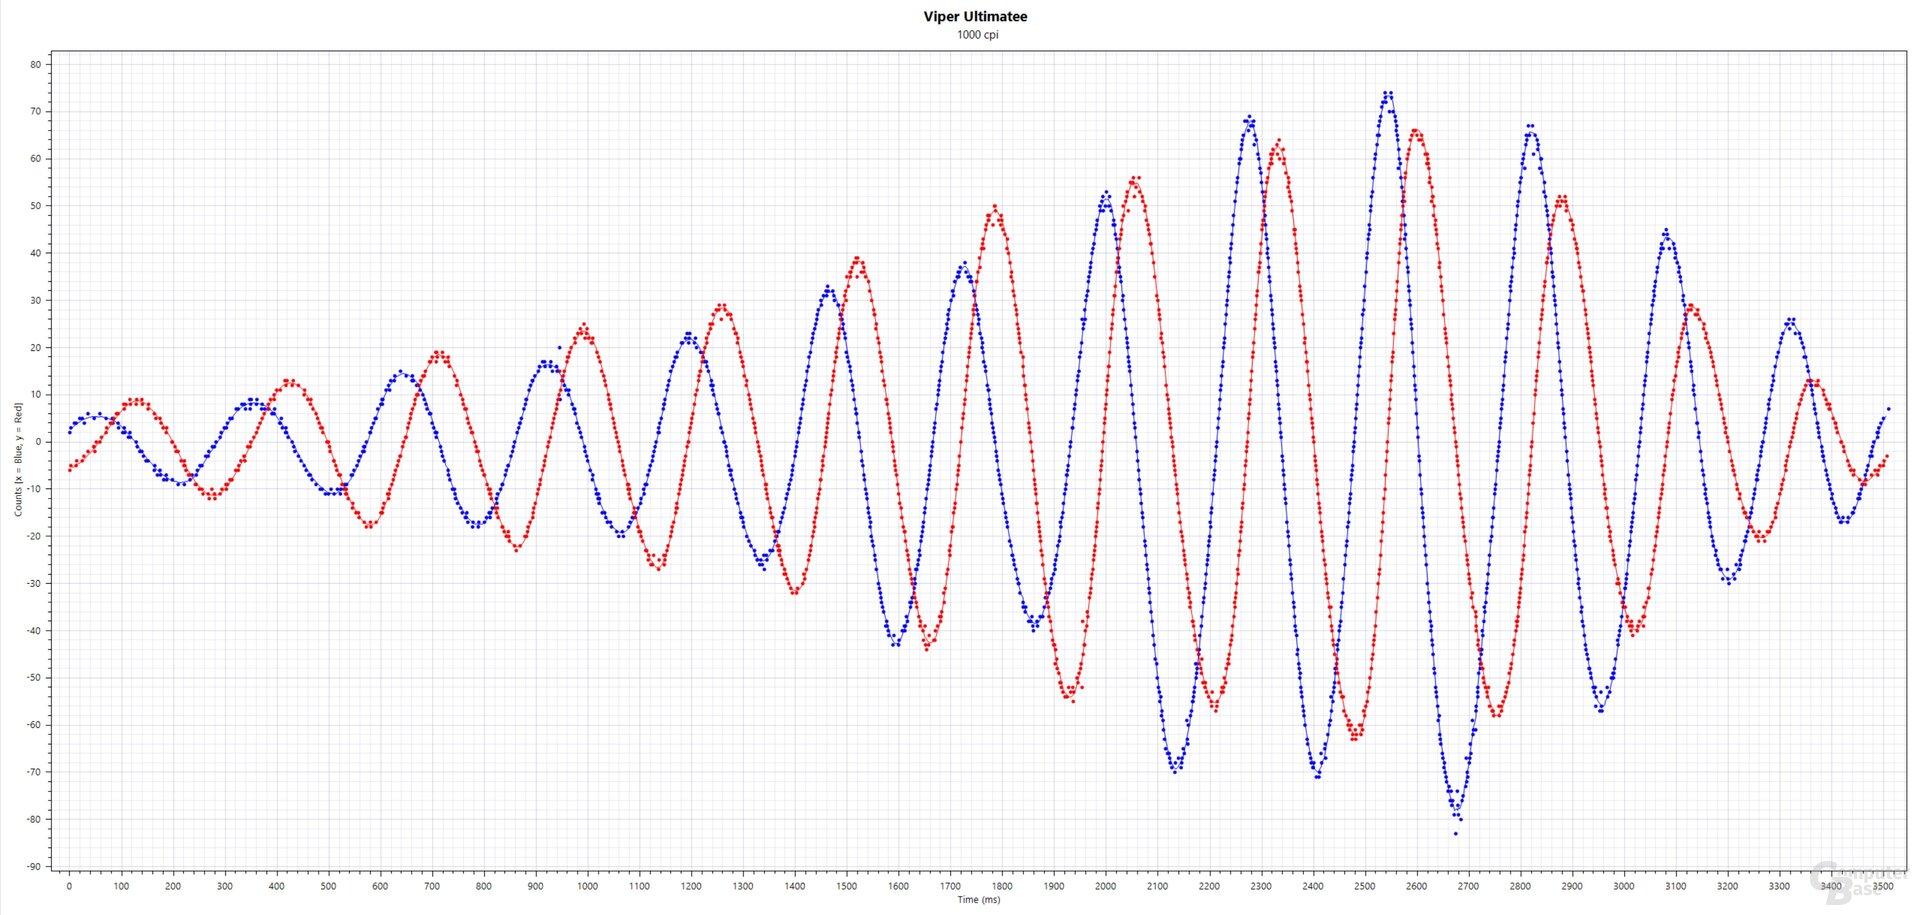 Blau: xCounts(ms), Rot: yCounts(ms); Razer Viper Ultimate (PixArt PMW-3399, 1.000 cpi, 1.000 Hertz, Stoffmauspad)